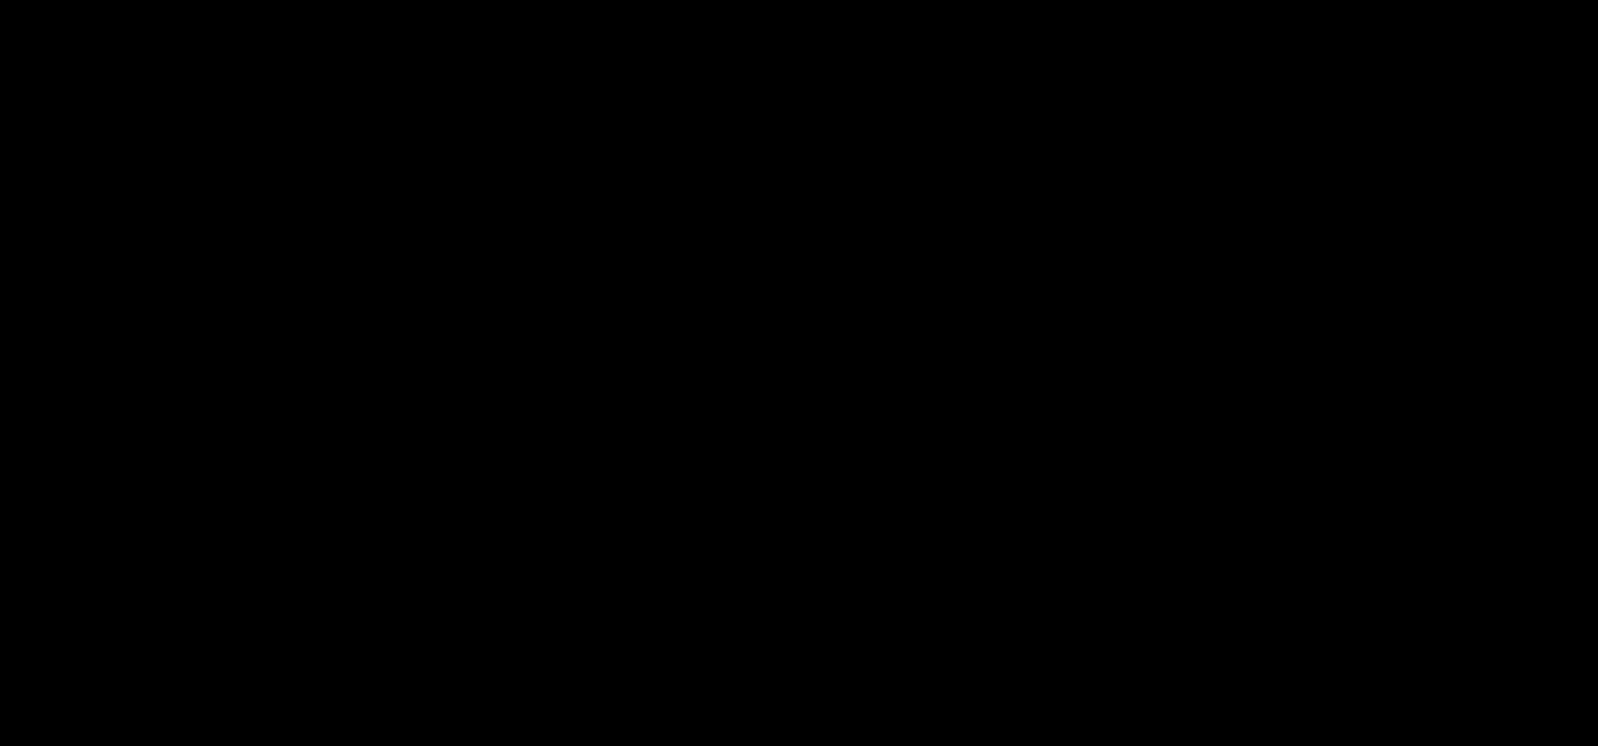 CCI-Main-Logotype-BlackOnTransparent